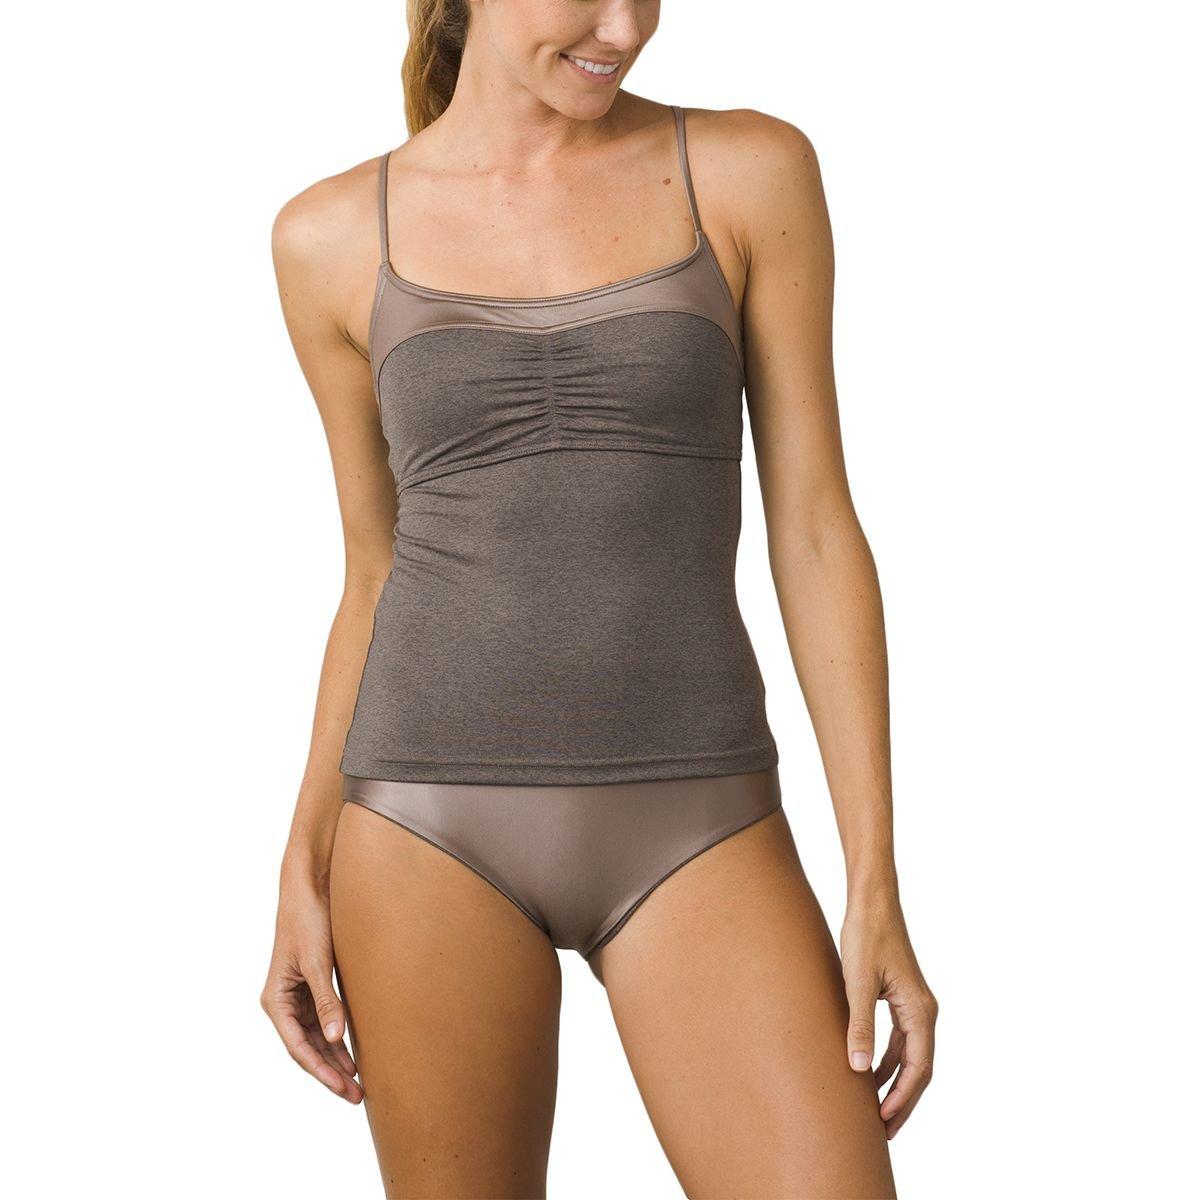 b03bb98053ccf Amazon.com: prAna Makoa Tankini Swim Tops: Clothing